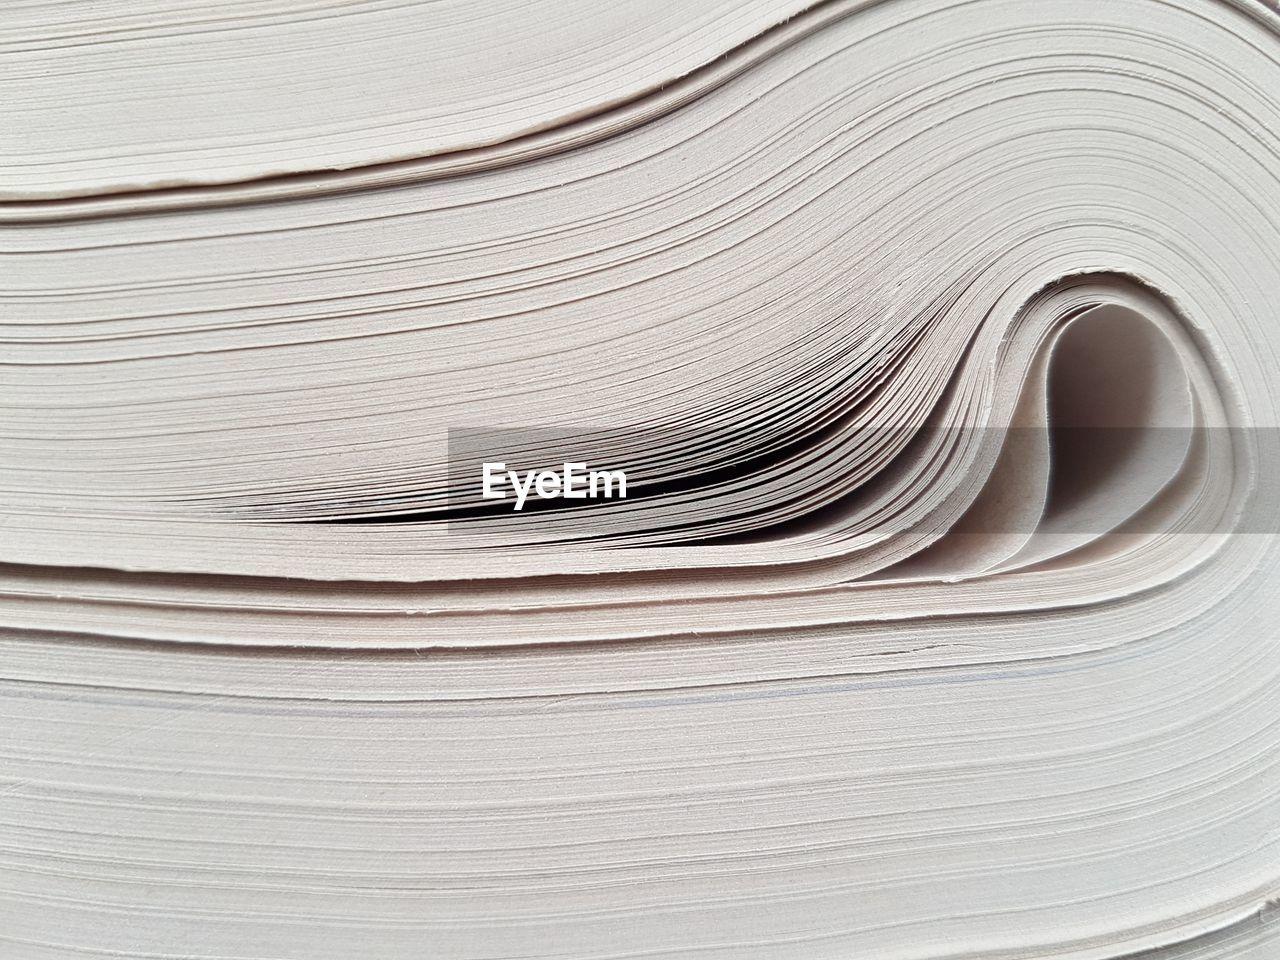 Full frame shot of papers